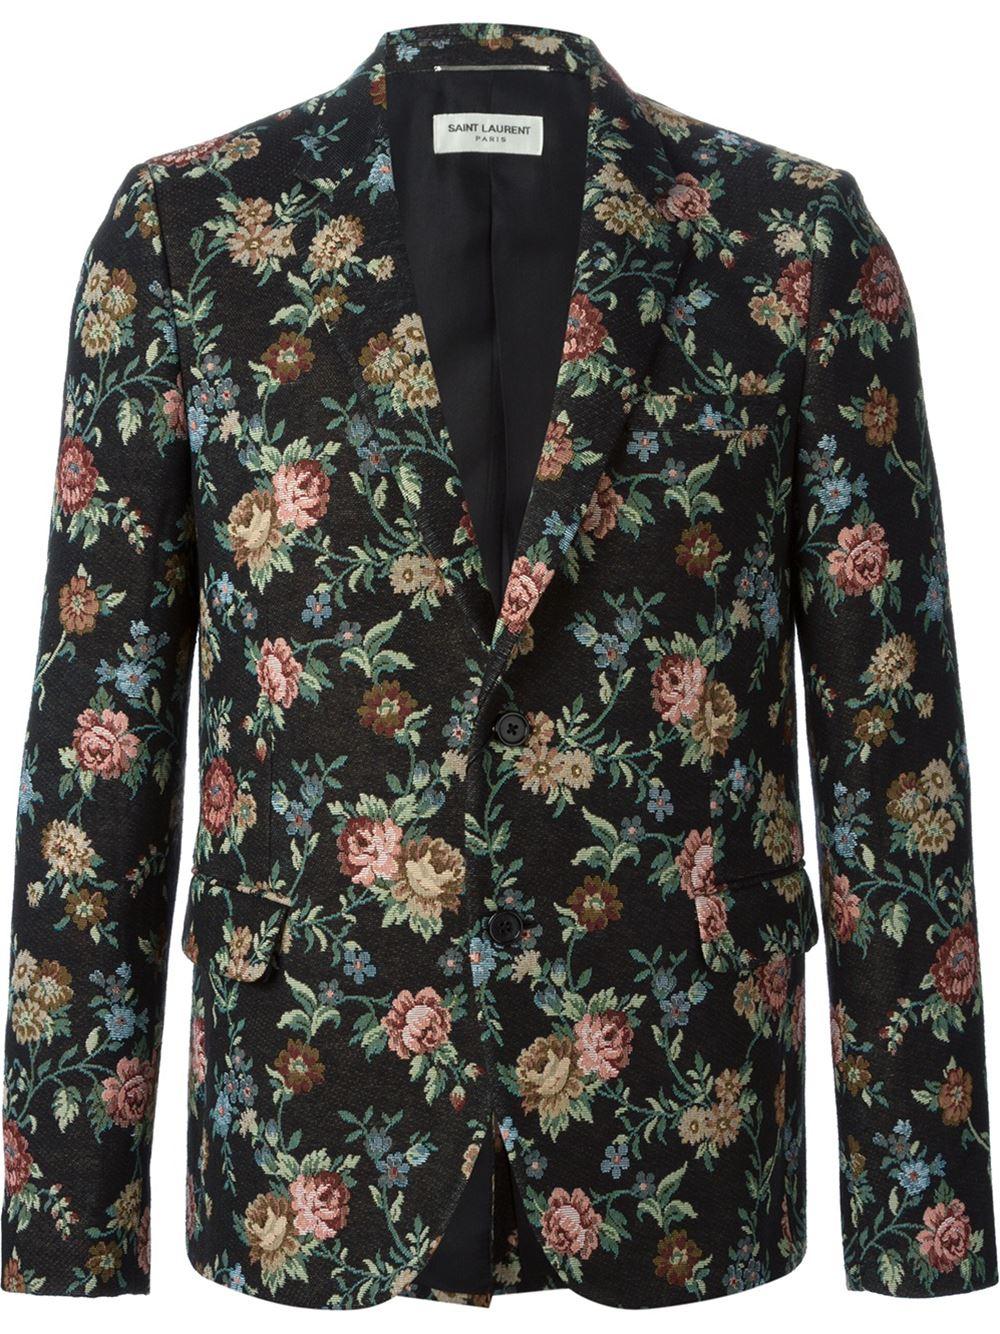 0469d62286b Saint Laurent Floral Jacquard Blazer in Black for Men - Lyst